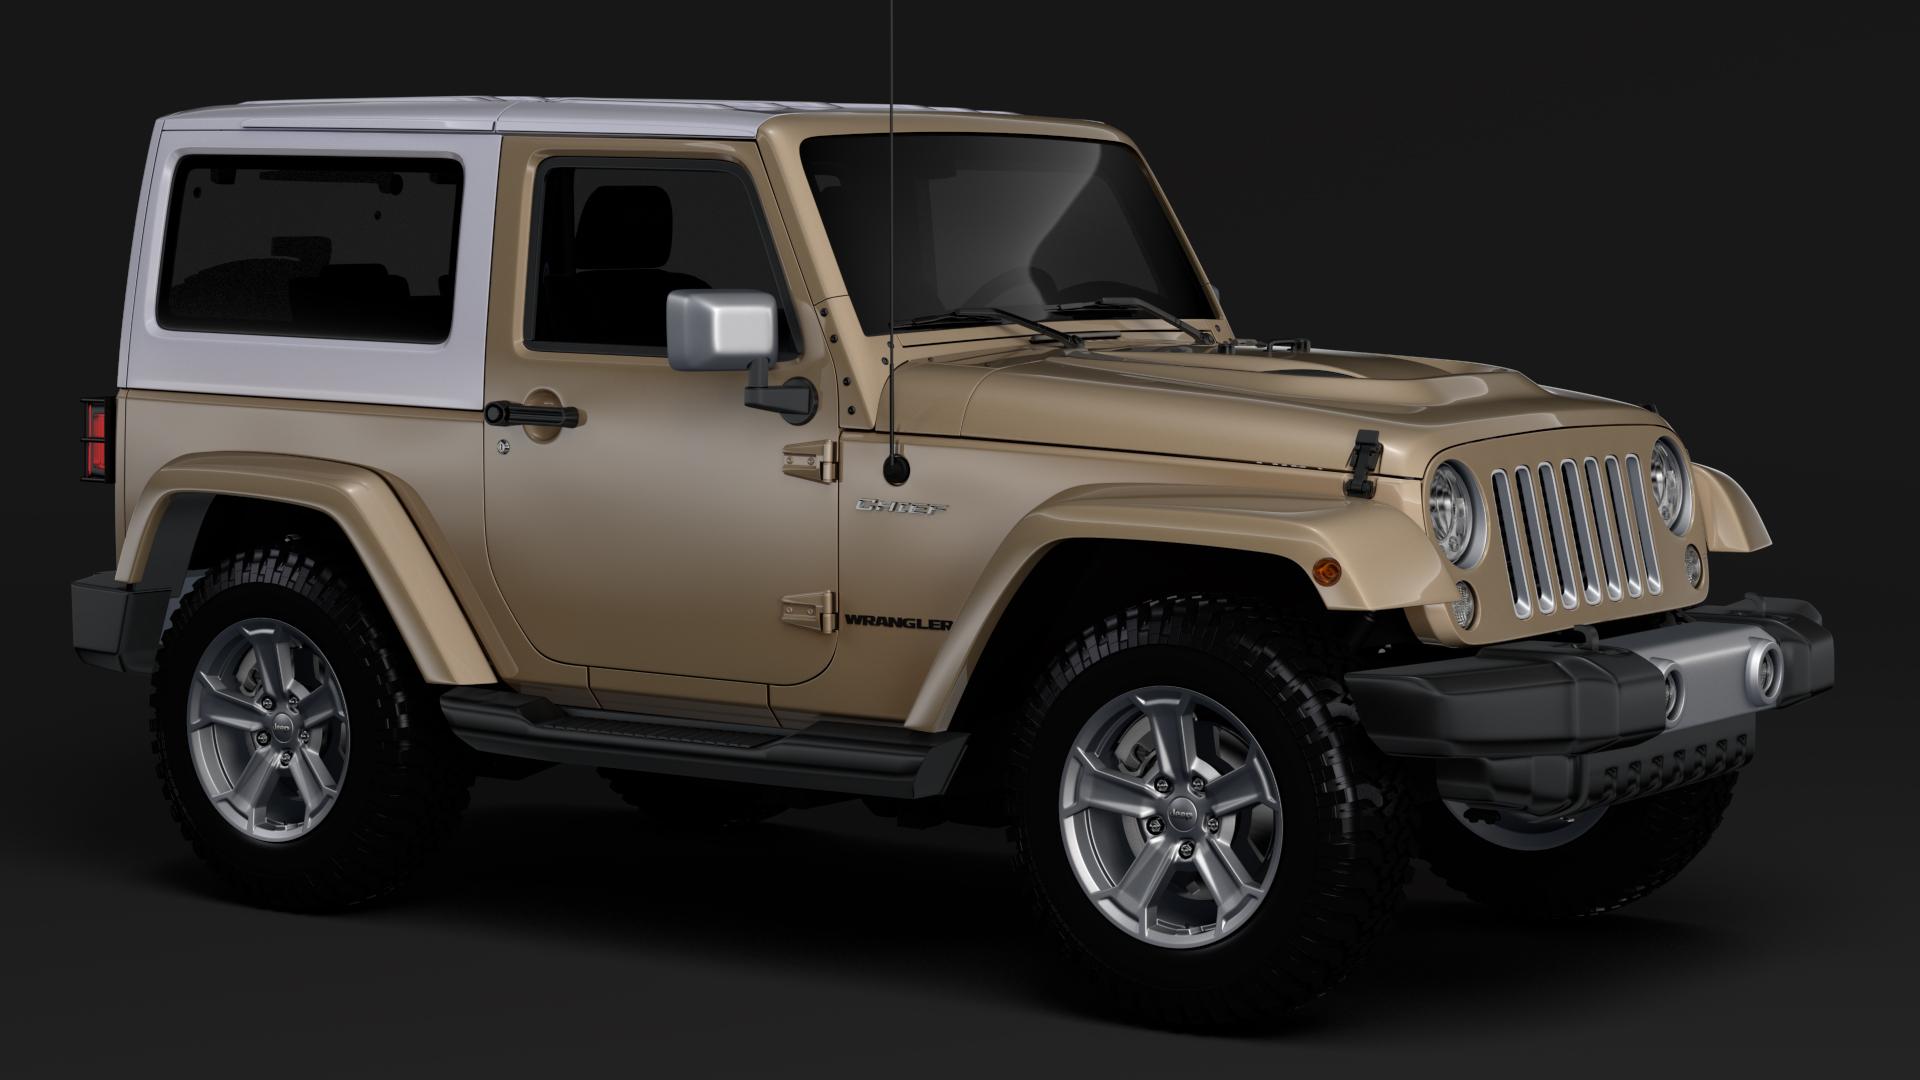 jeep wrangler chief jk 2017 3d model max fbx c4d lwo ma mb hrc xsi obj 276877